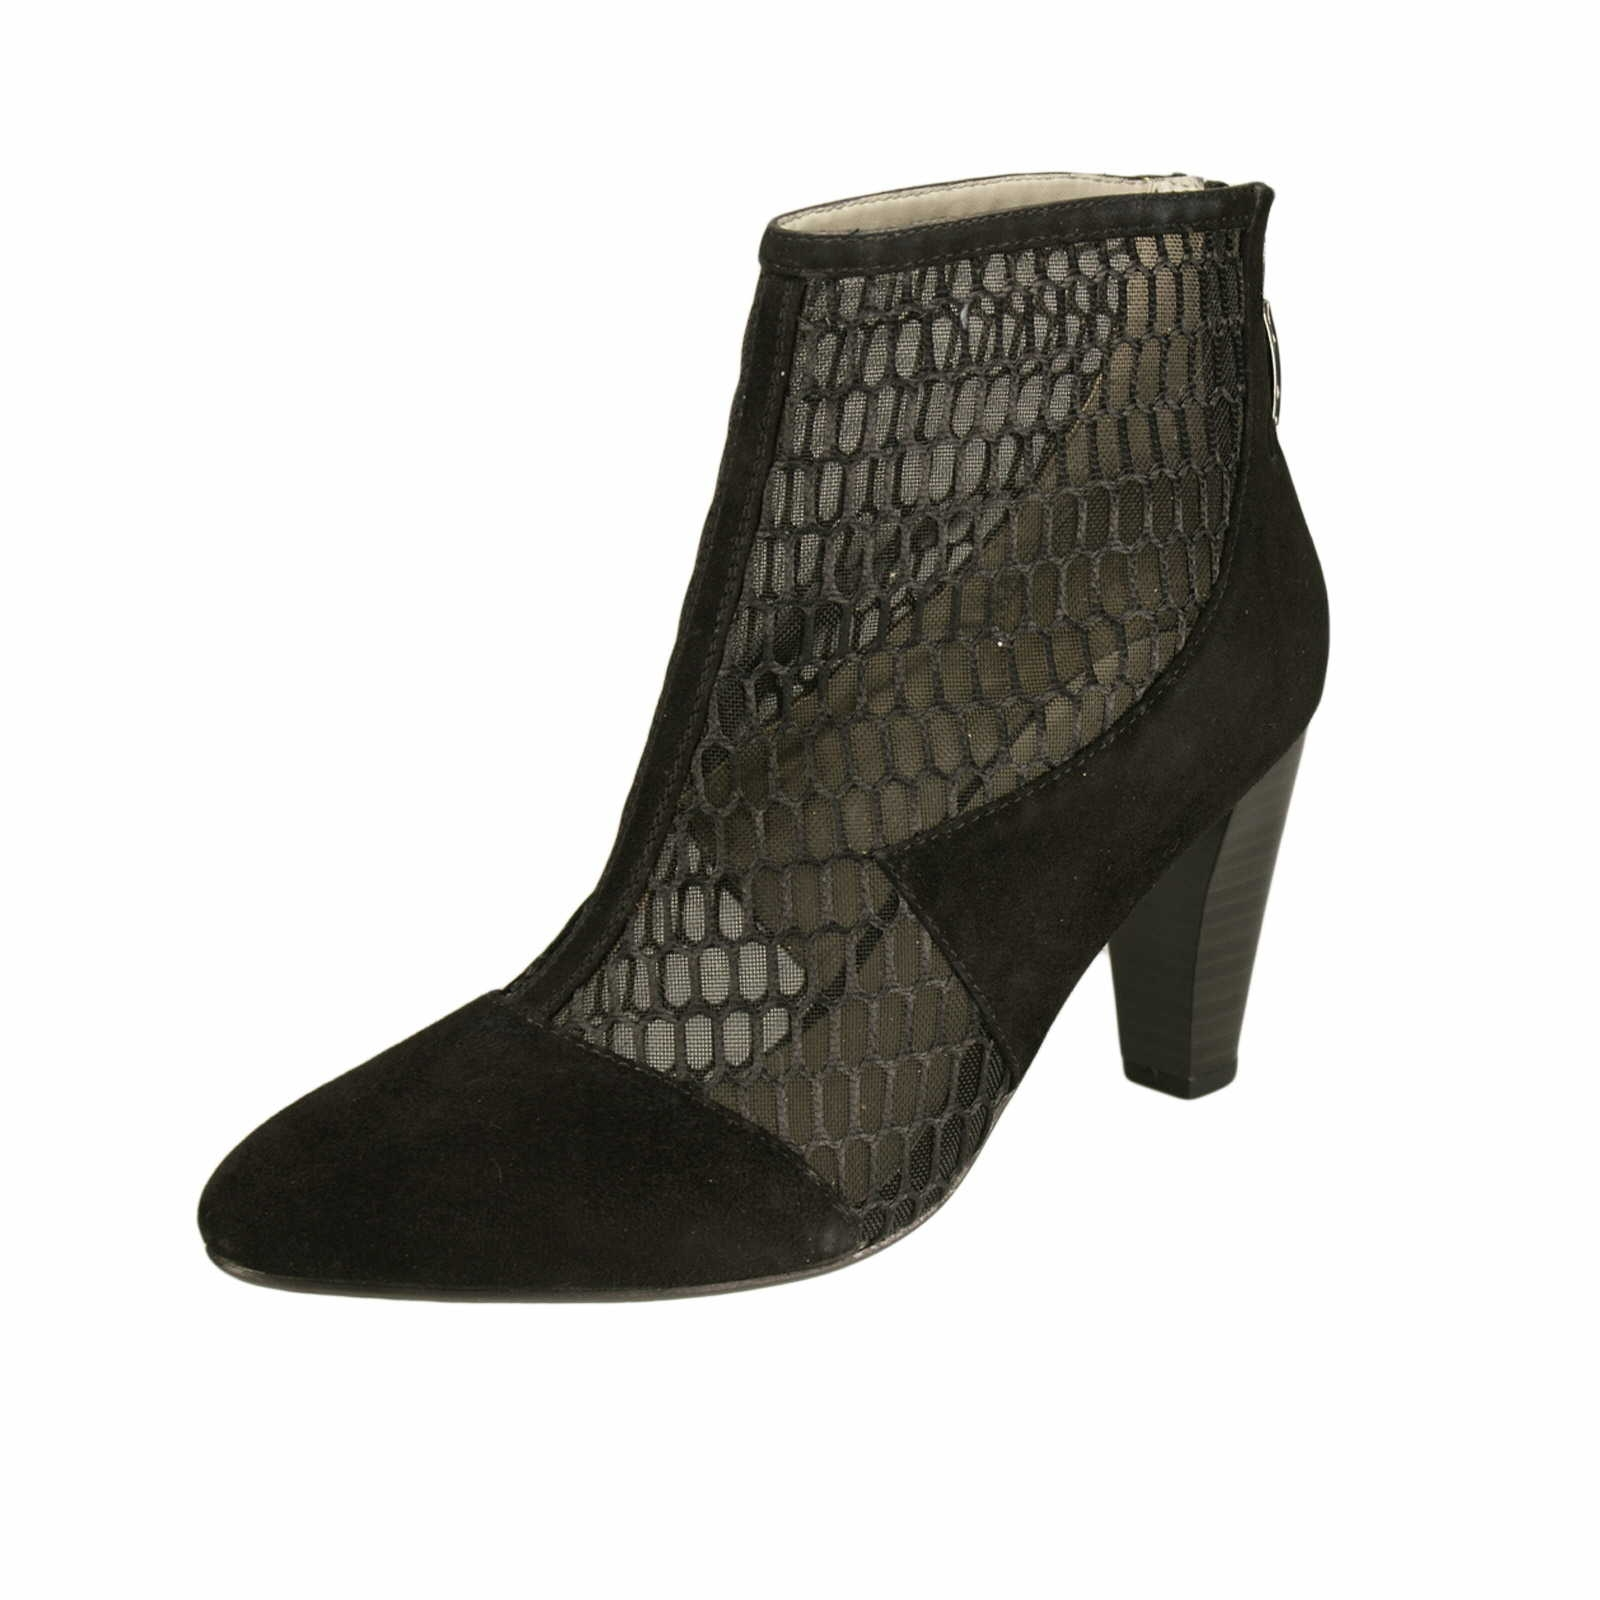 gerry weber shoes schwarz josefine 06 g39916 16 100 schuhparadies online shop schuhe. Black Bedroom Furniture Sets. Home Design Ideas